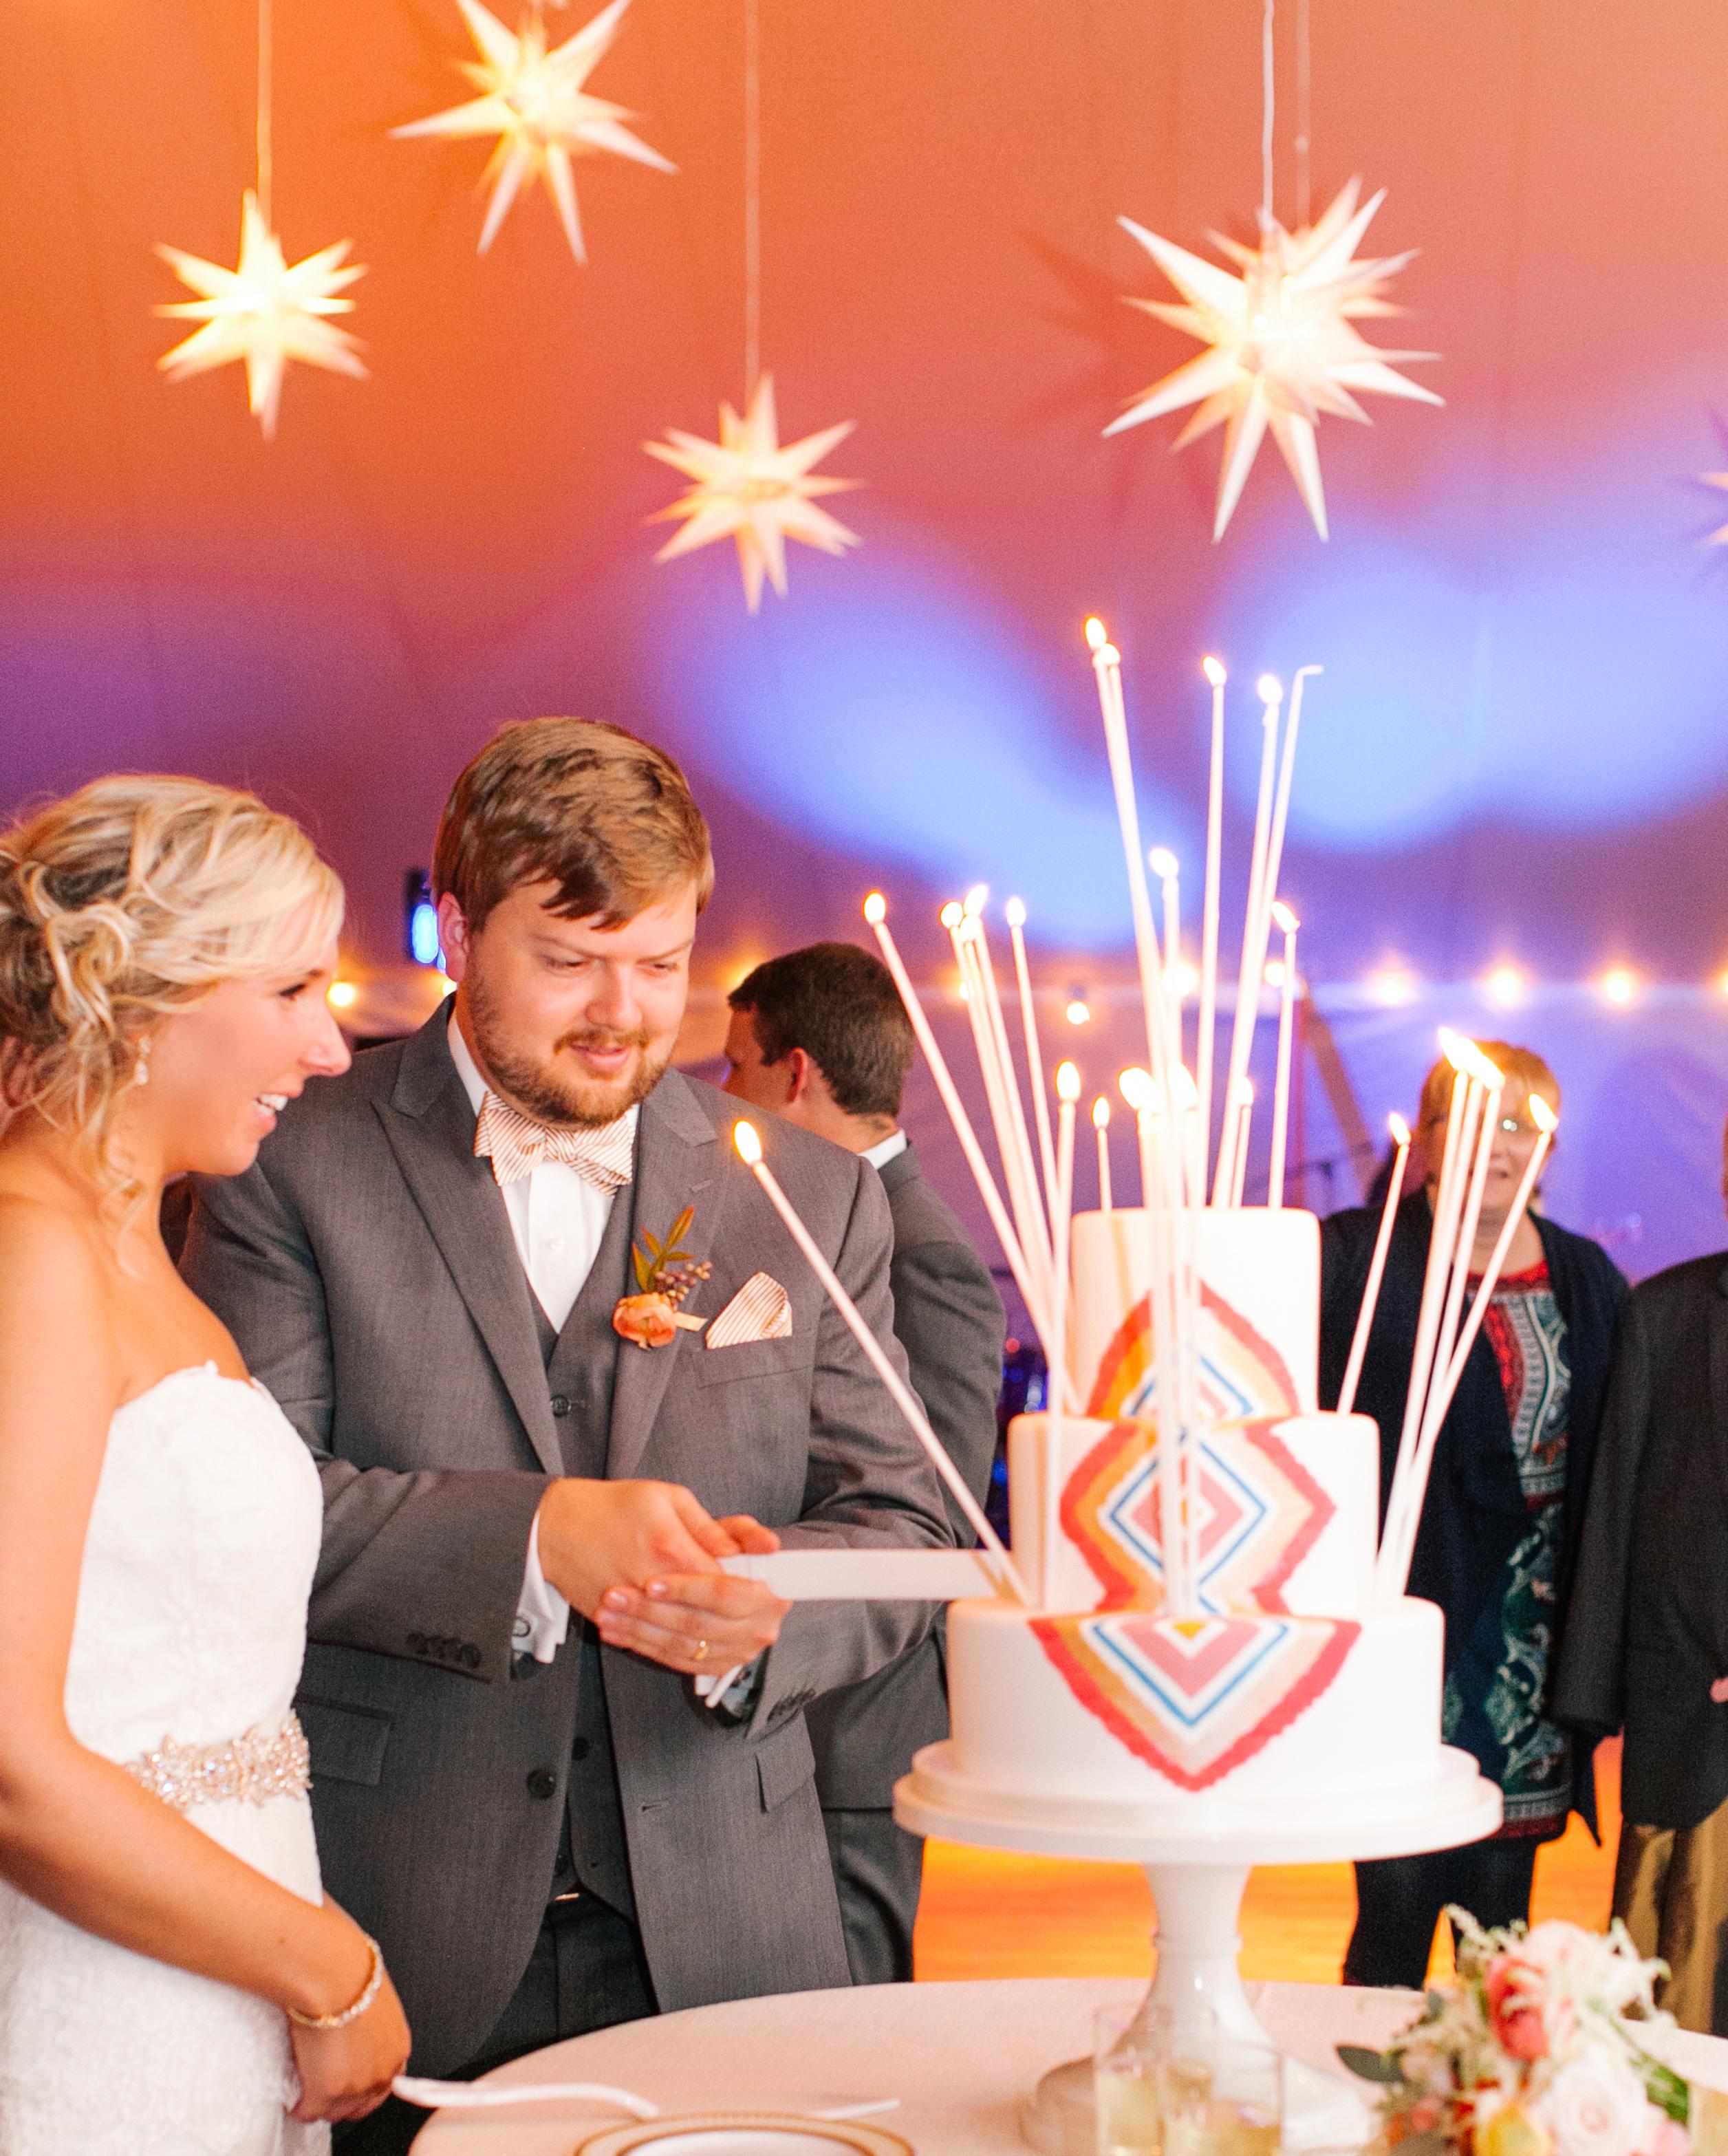 brittany-andrew-wedding-cakecutting-095-s112067-0715.jpg